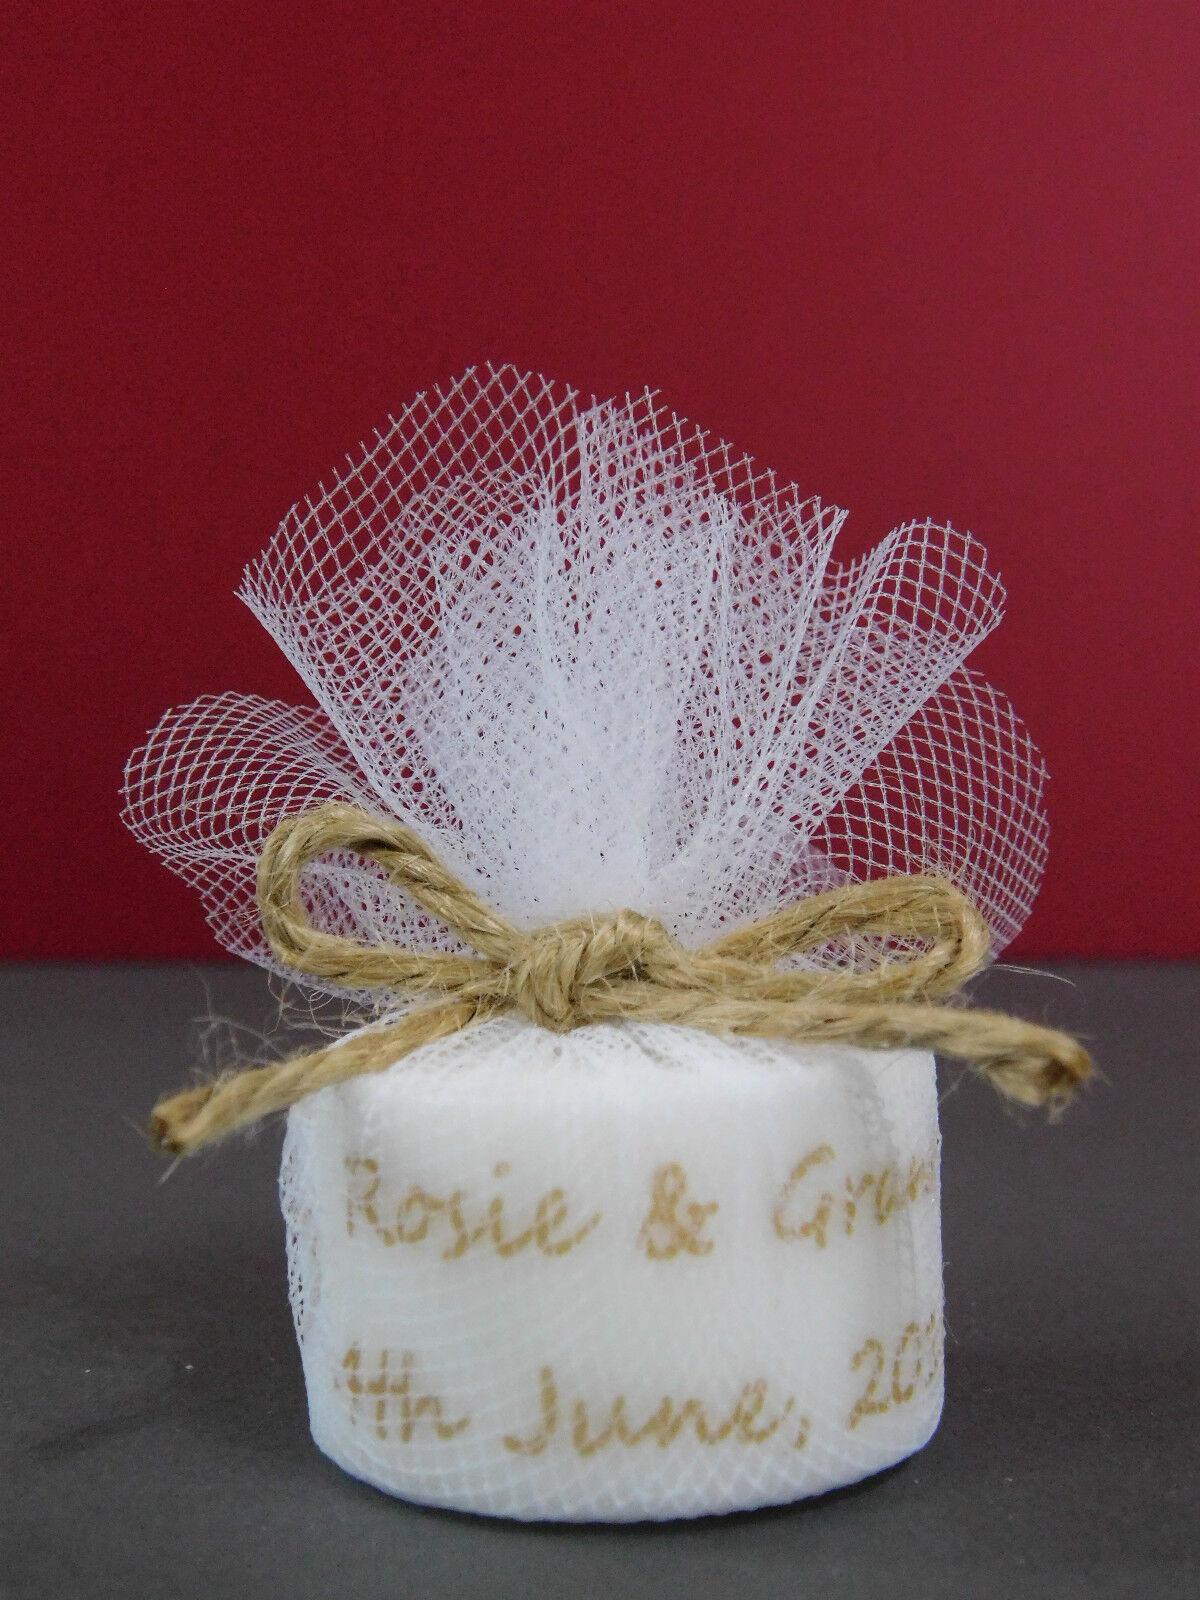 Stile Vintage Personalizzato Tealight Candele BOMBONIERE (Set (Set (Set di 200) 3cda87